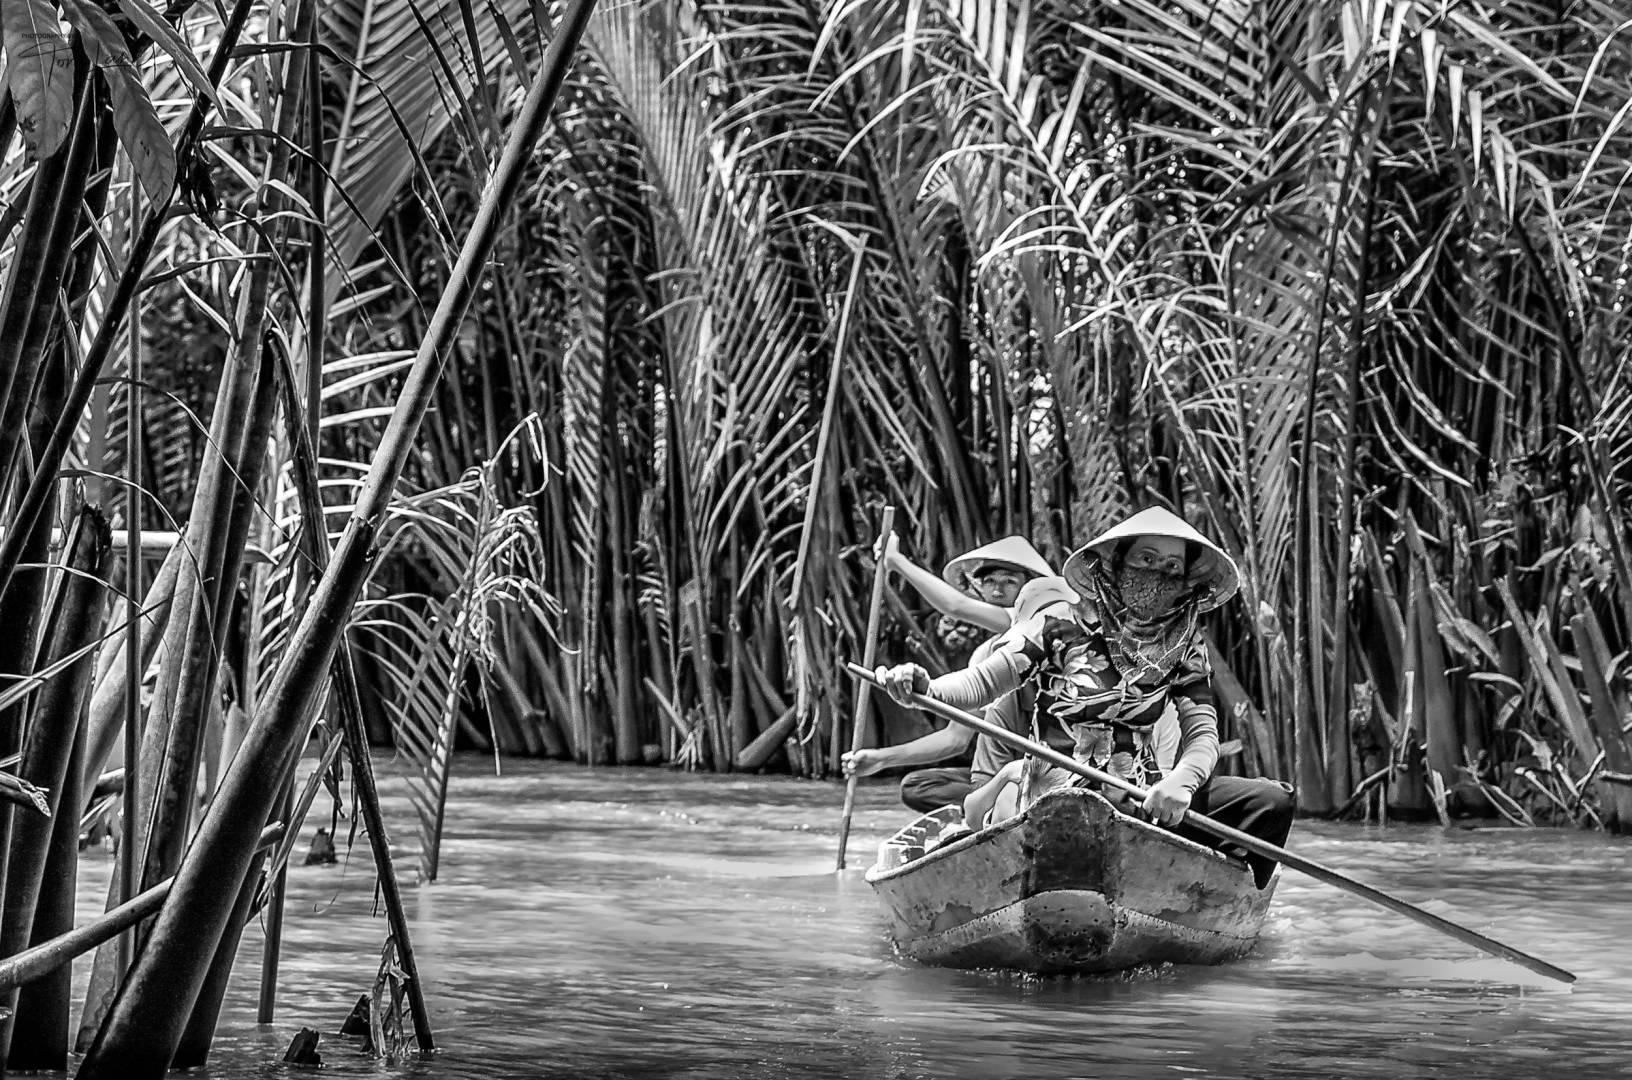 """Paddling the Mekong""' Vietnam (Leica M9 Monochrom and Tri-Elmar 28-35-50 set at 35mm)"